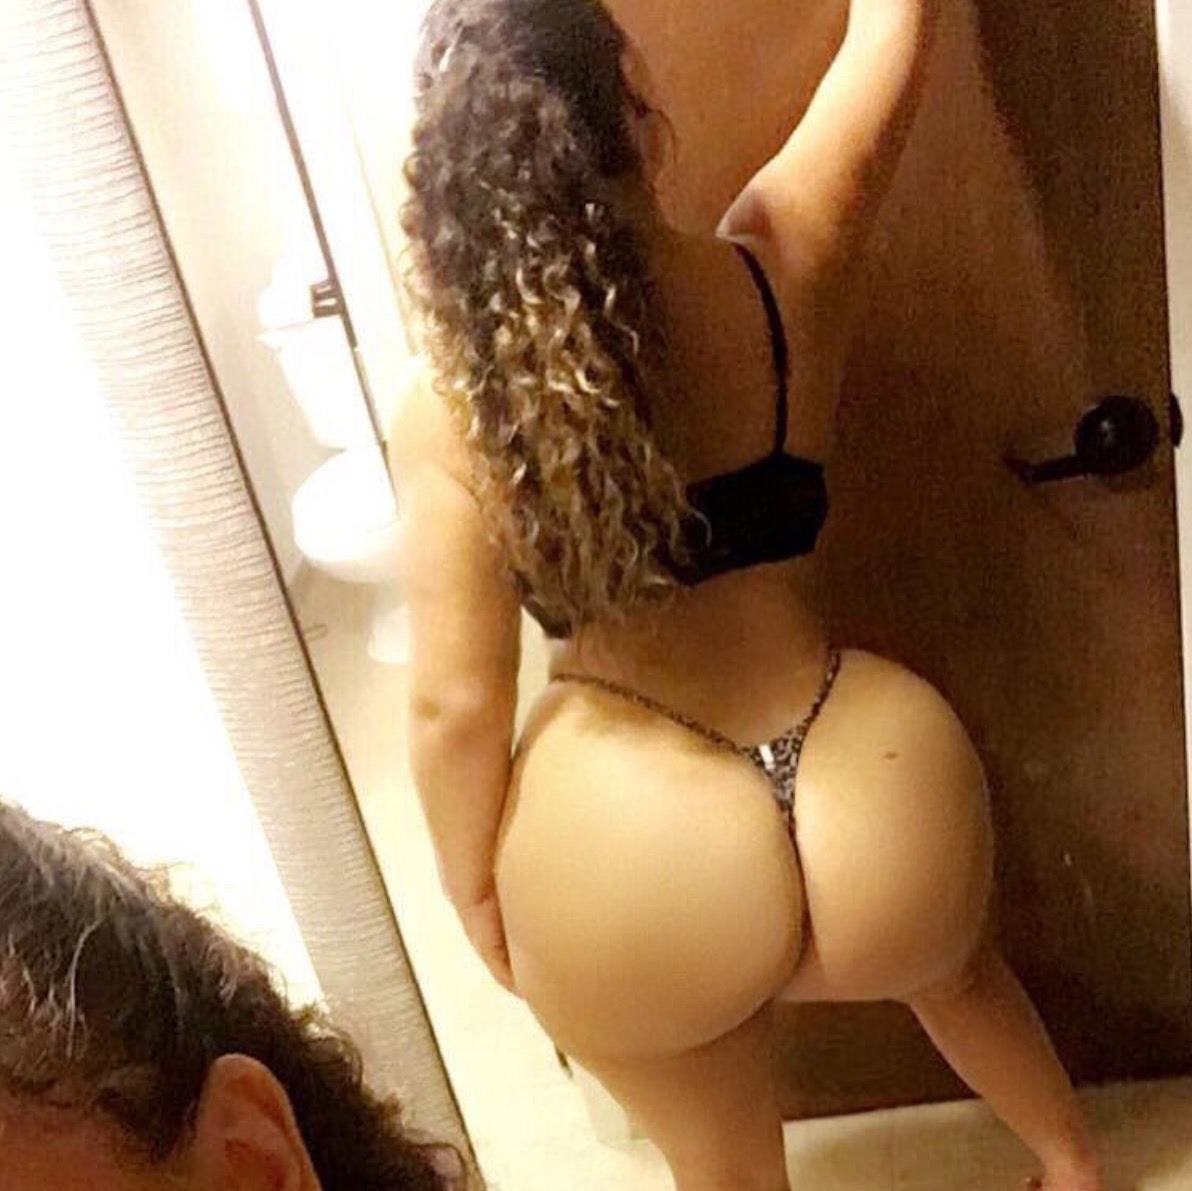 Big booty girls you tube saxy imajs  sexy lesbian bootie shaking